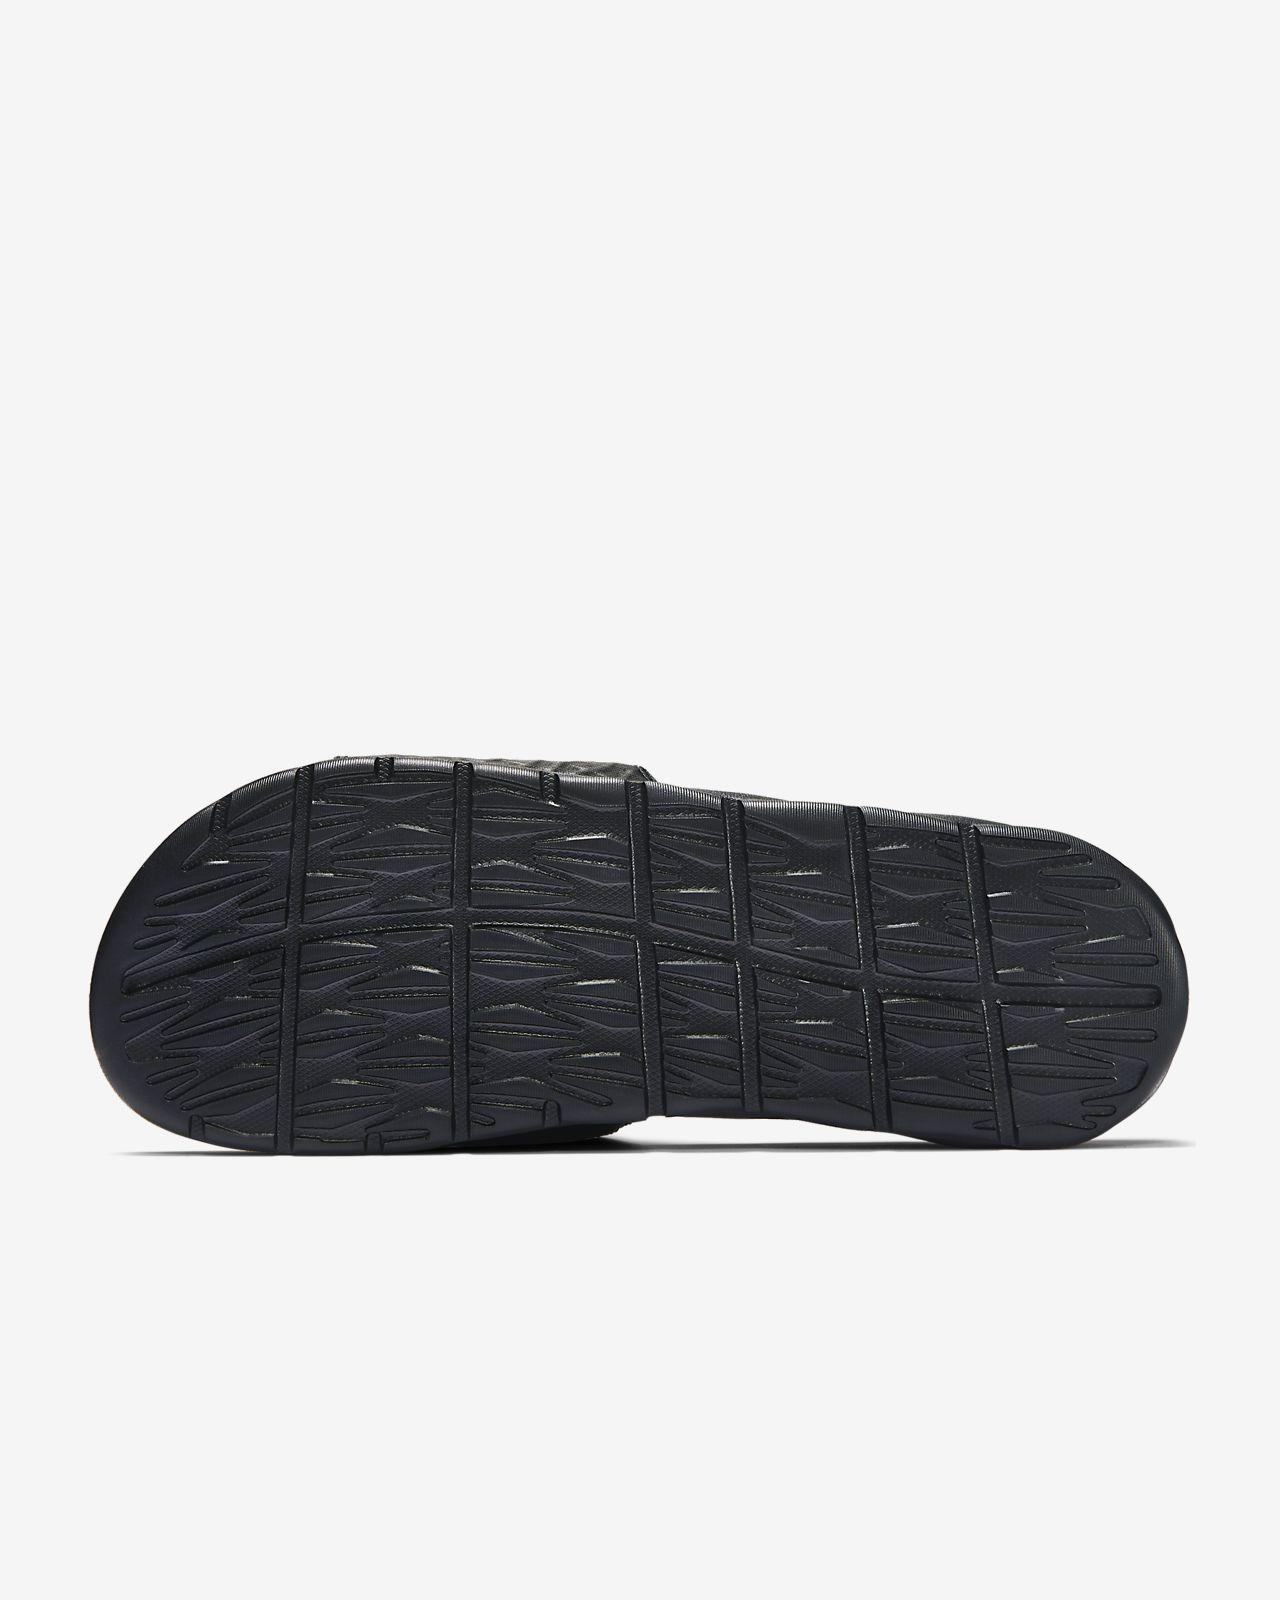 435d6c56e41f Nike Benassi Solarsoft 2 Men s Slide. Nike.com